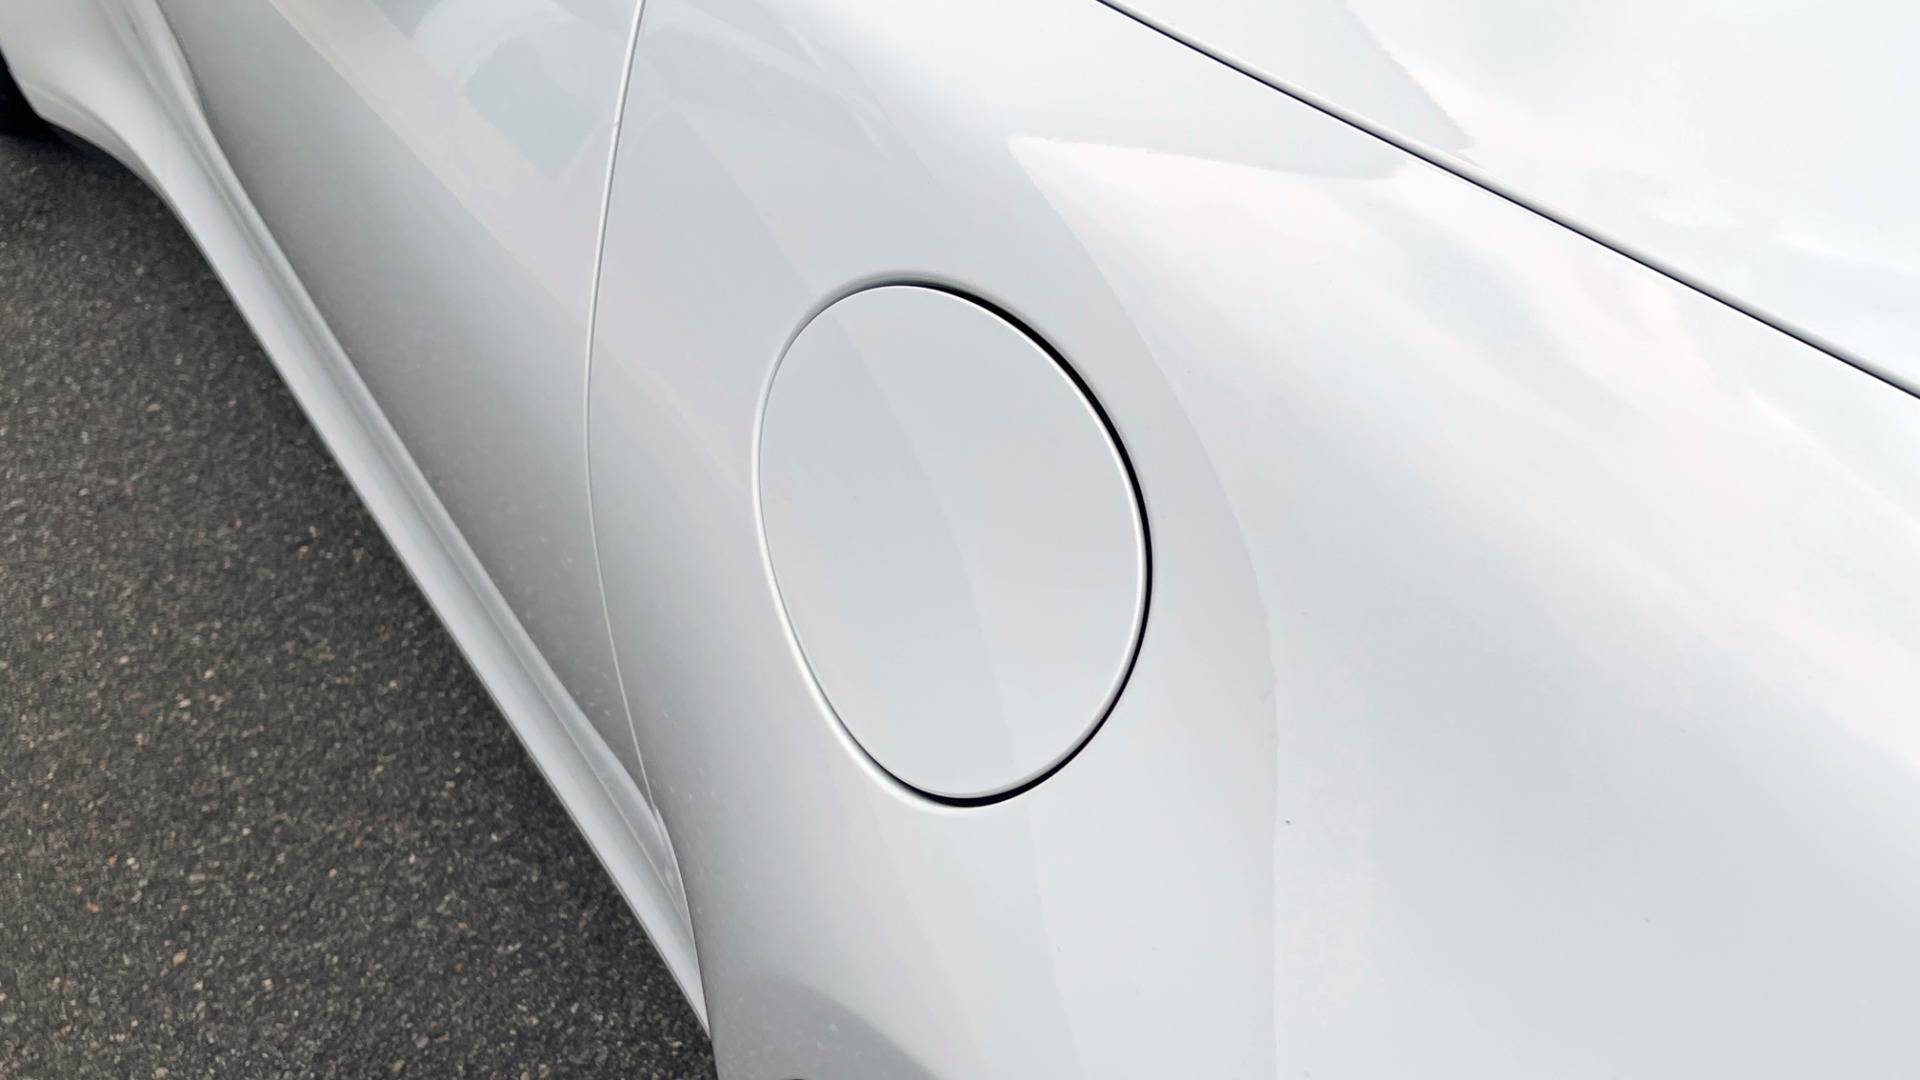 Used 2020 Porsche 911 CARRERA 4S CABRIOLET PREMIUM SPORT PKG / NAV / BOSE / LIGHT DESIGN PKG for sale $167,595 at Formula Imports in Charlotte NC 28227 27